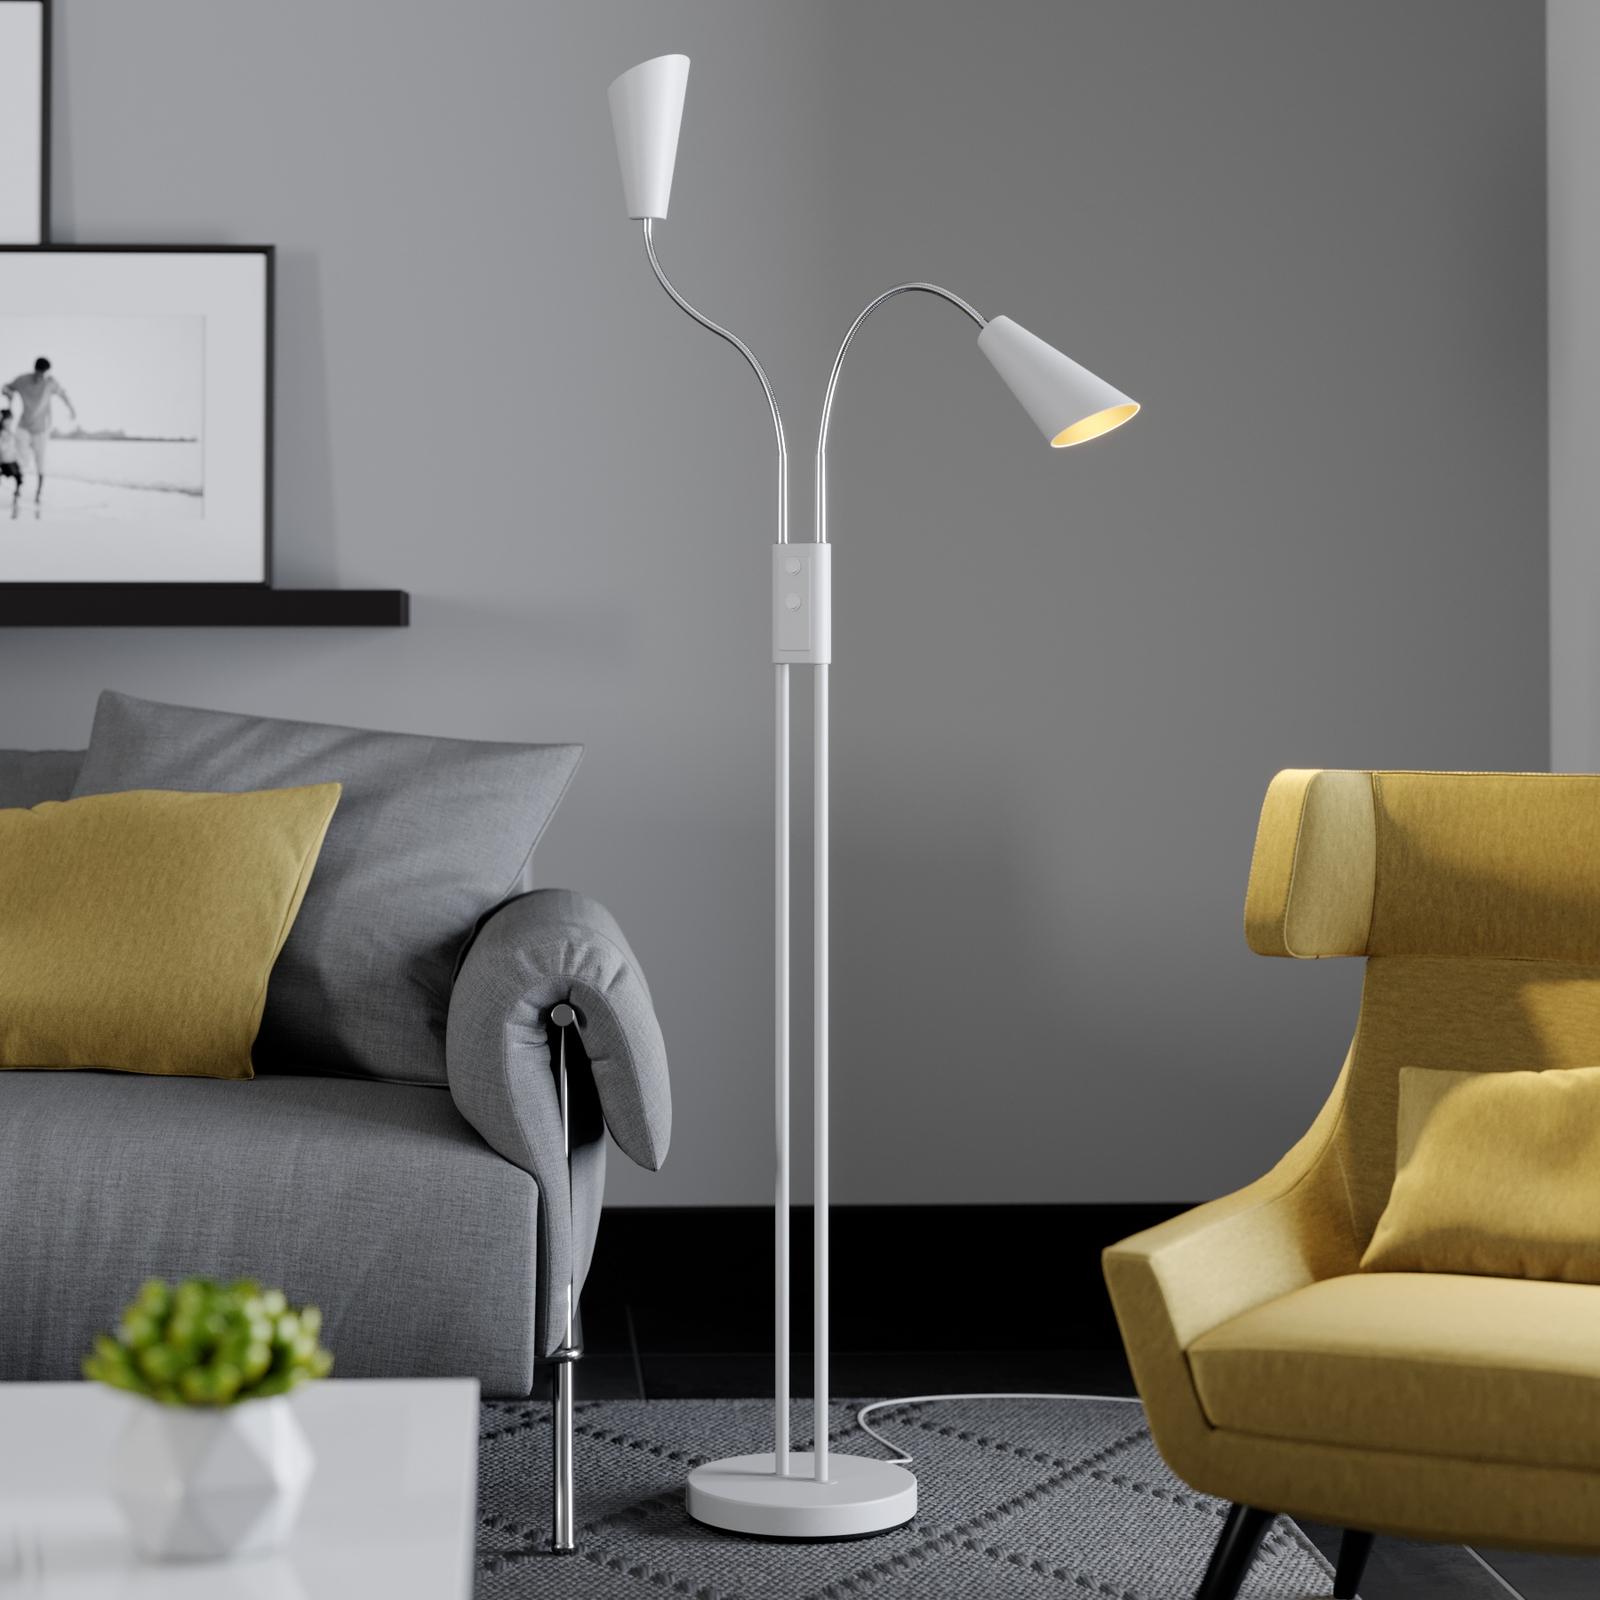 Lucande Medira lampadaire à 2 lampes, blanc